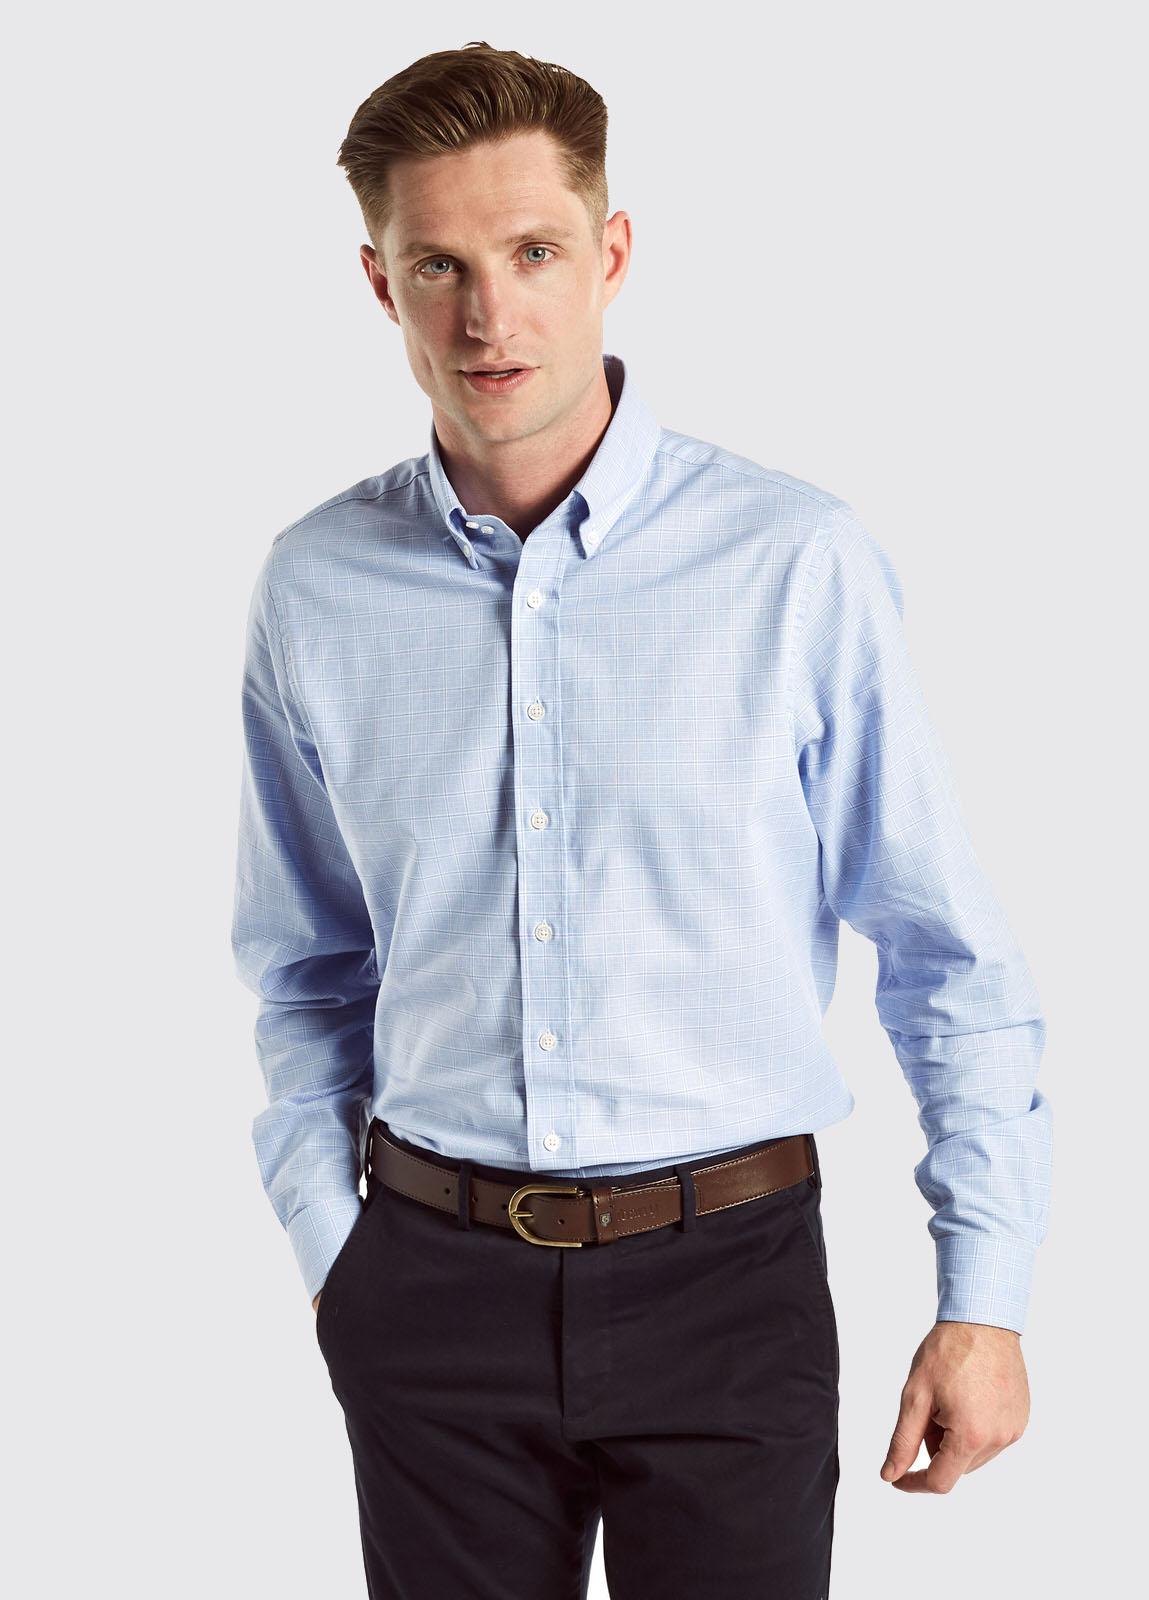 Glasnevin Shirt - Blue